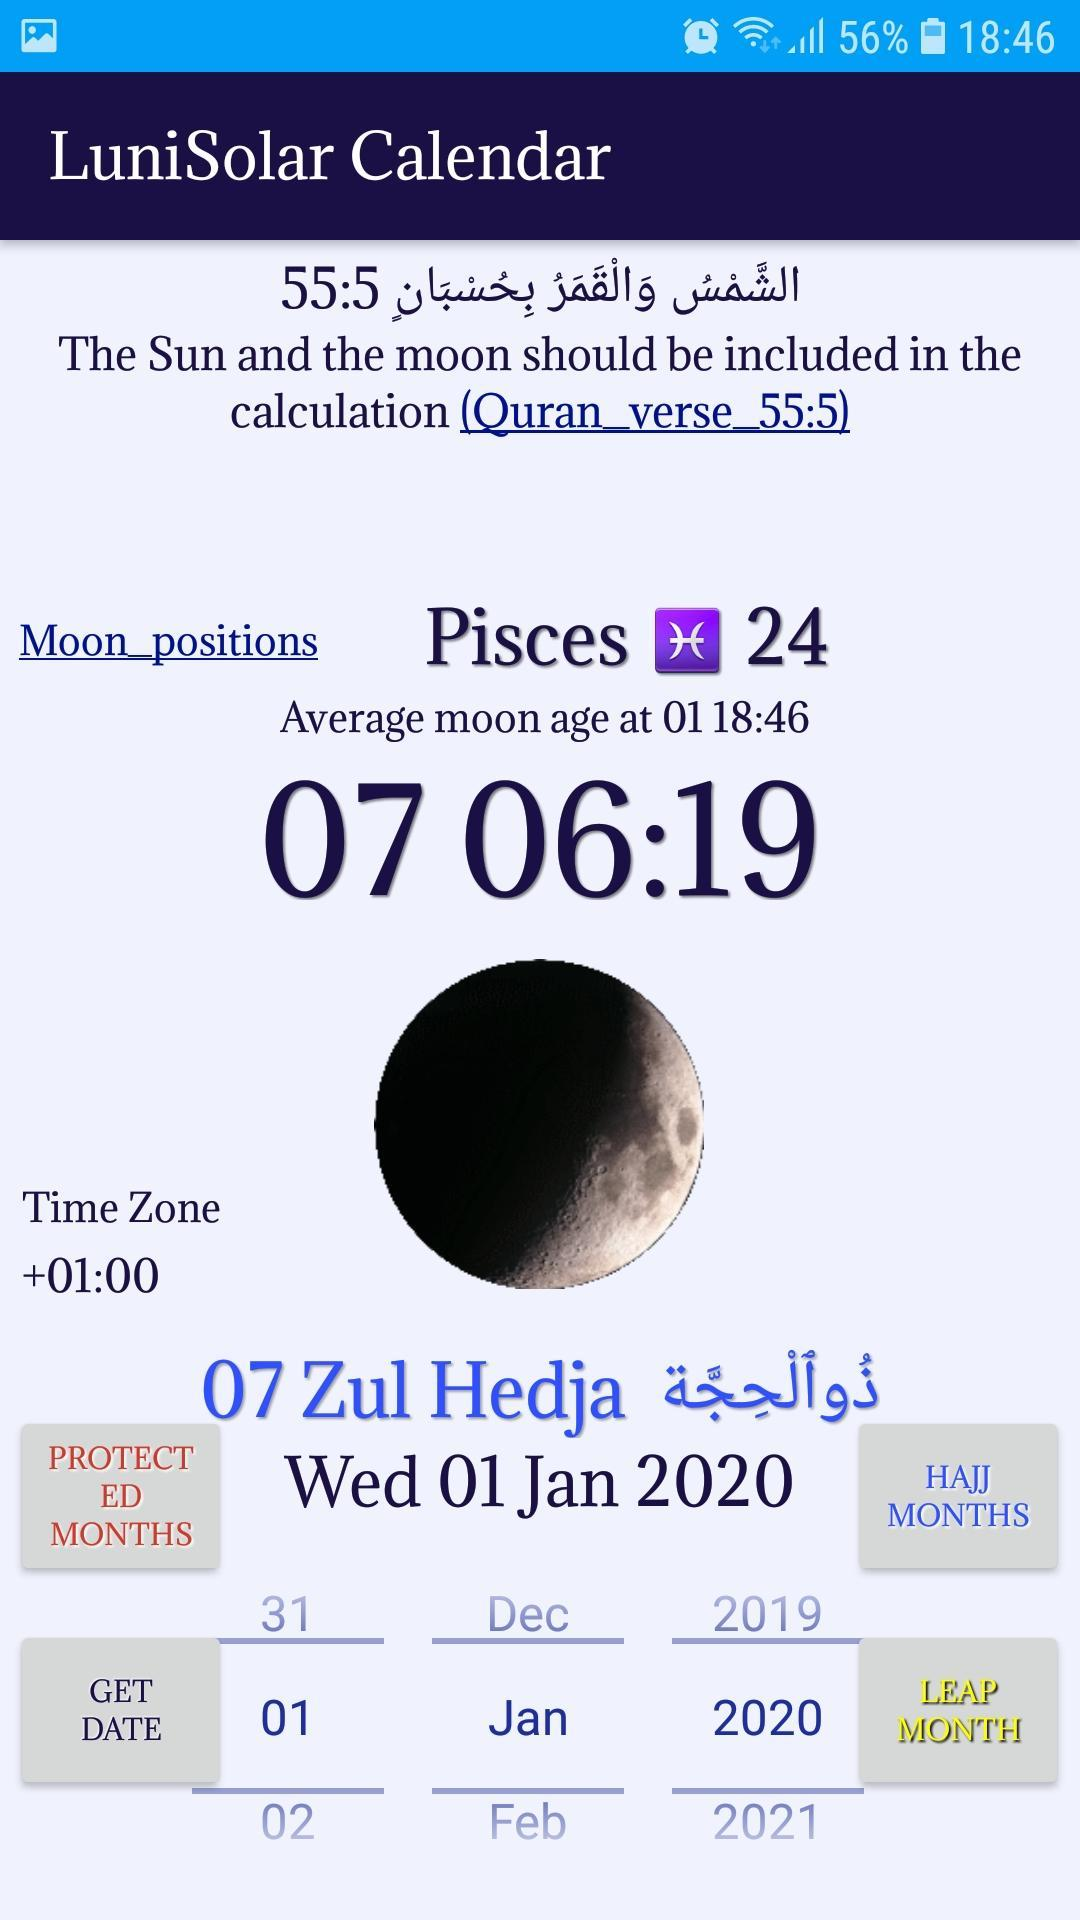 Lunisolar Calendar 2021 LuniSolar Calendar for Android   APK Download